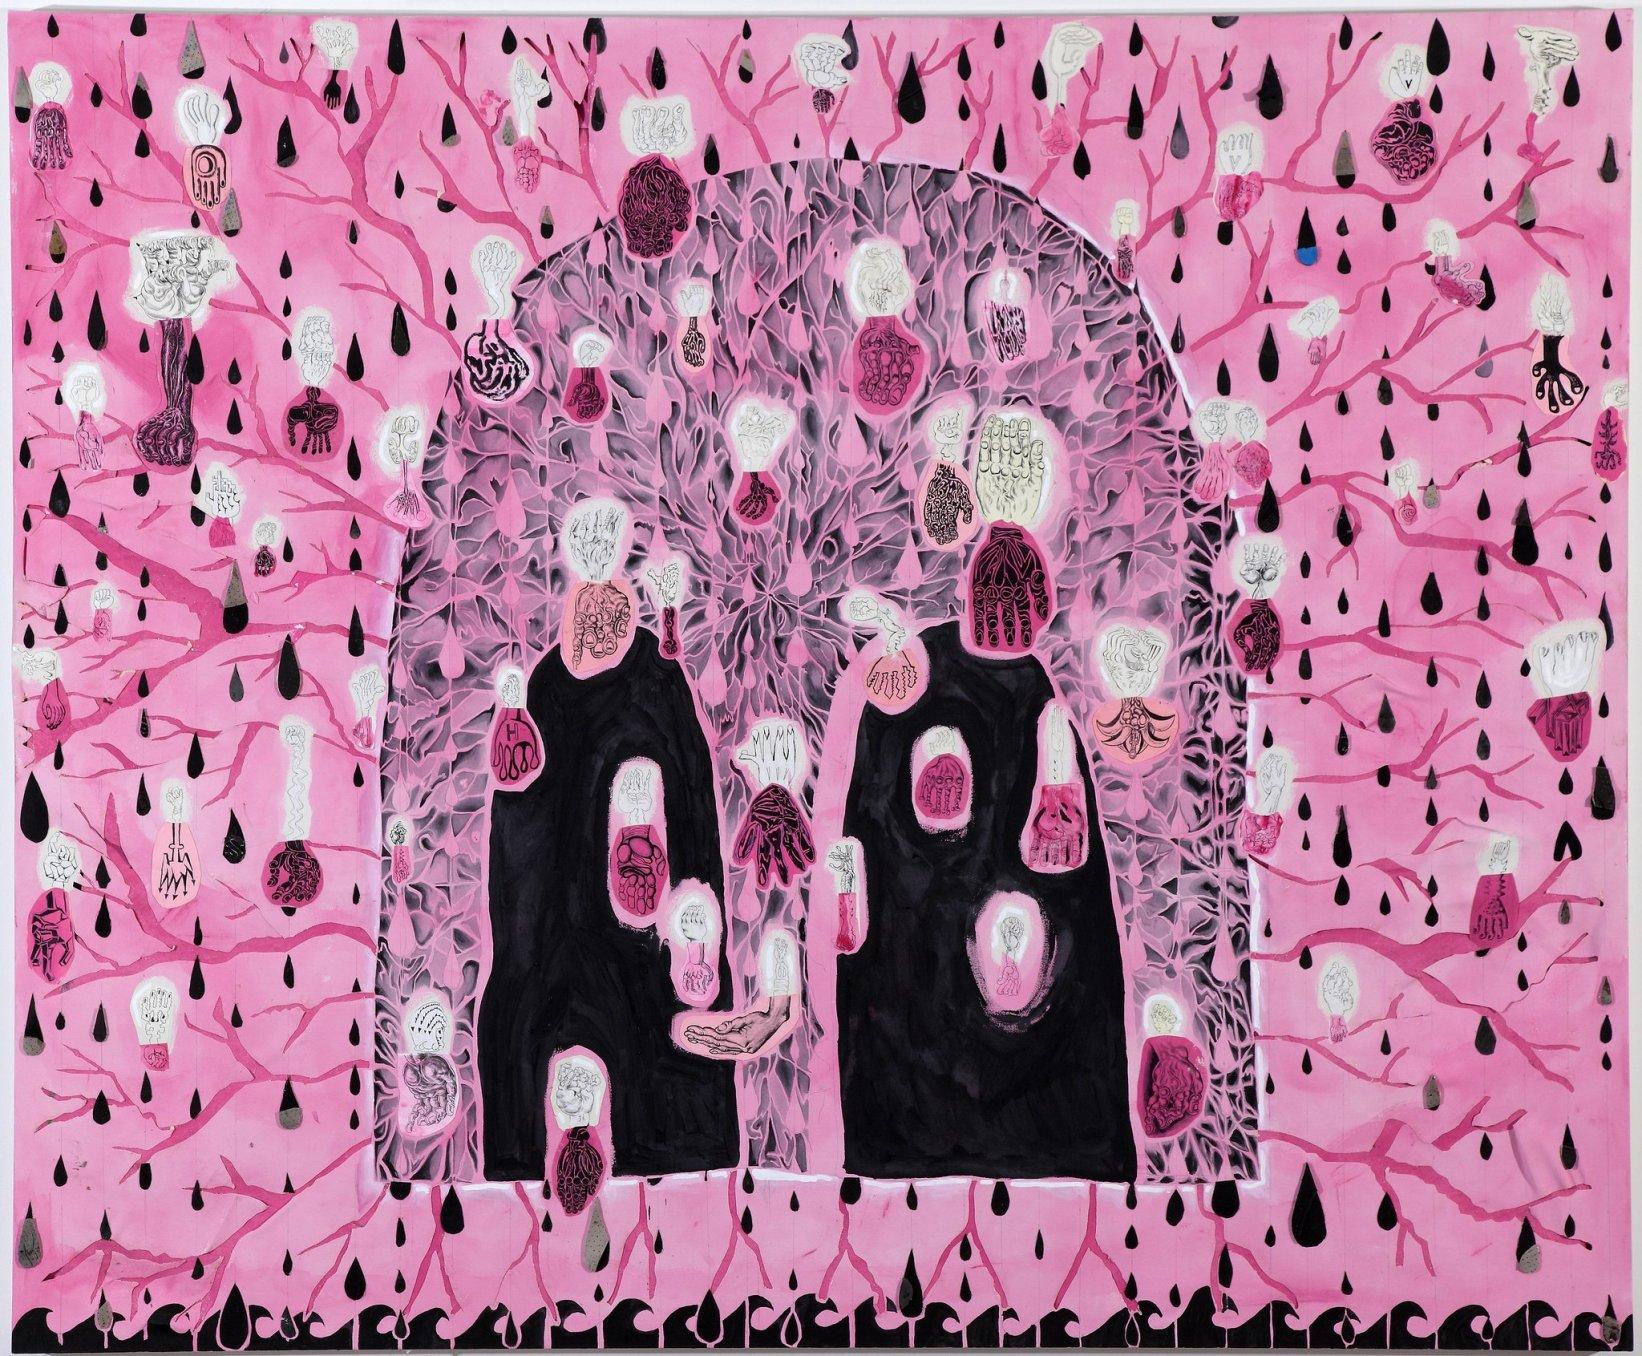 Trenton Doyle Hancock, Campbell's Streetlight, 2010